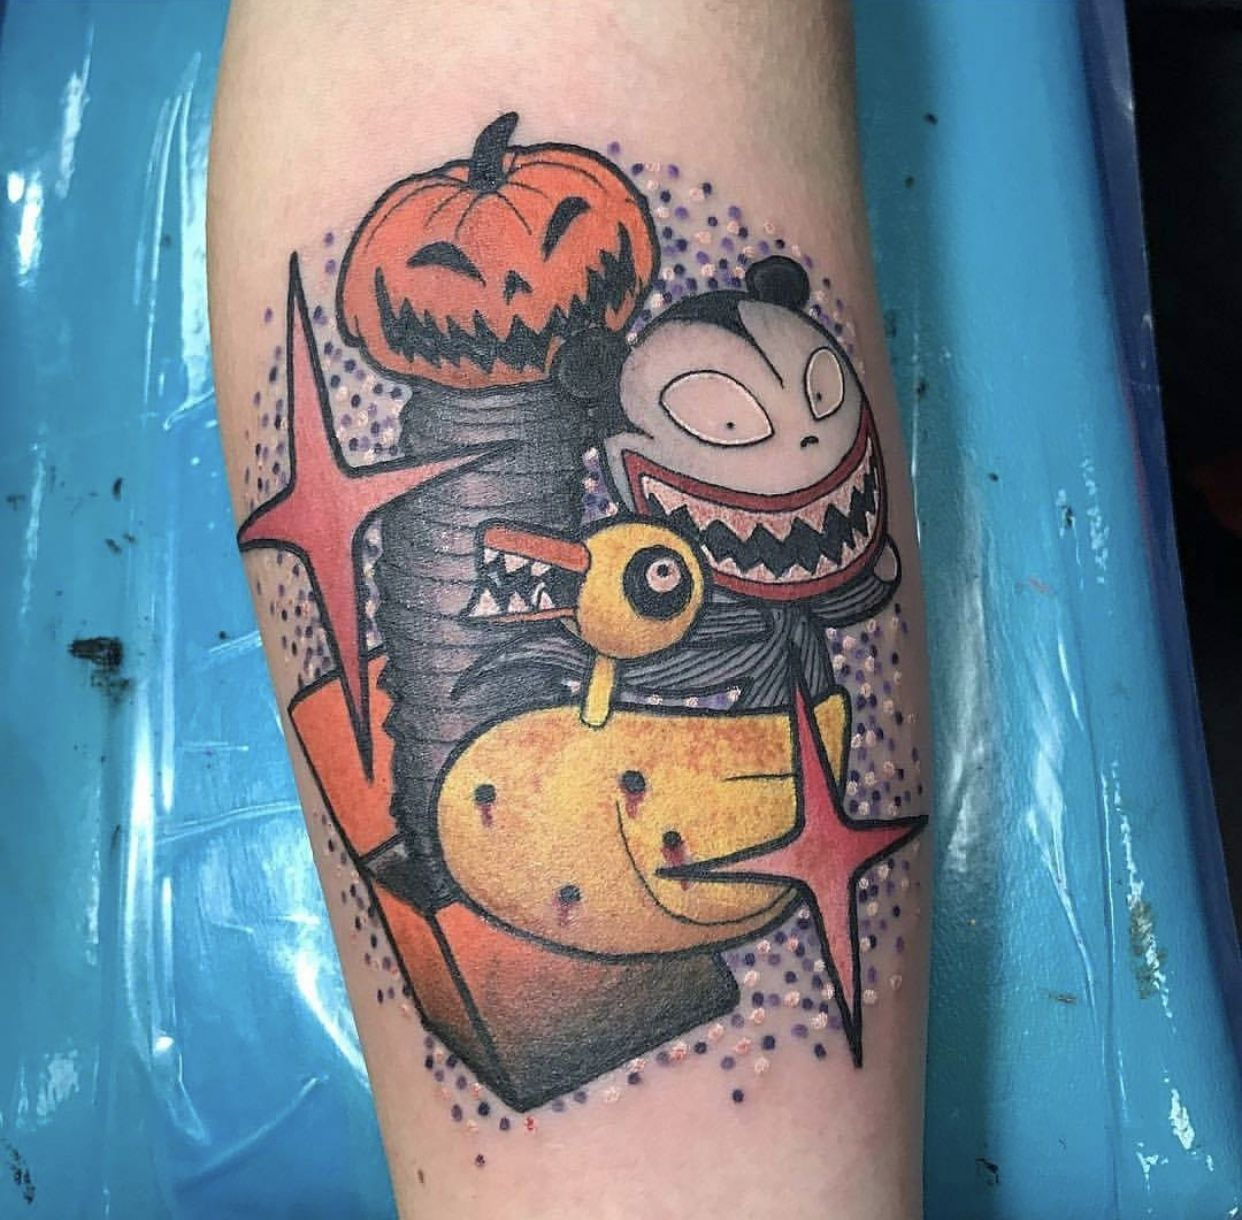 Pin by Debbie Sanchez on Disney Tattoos | Pinterest | Tattoo ...